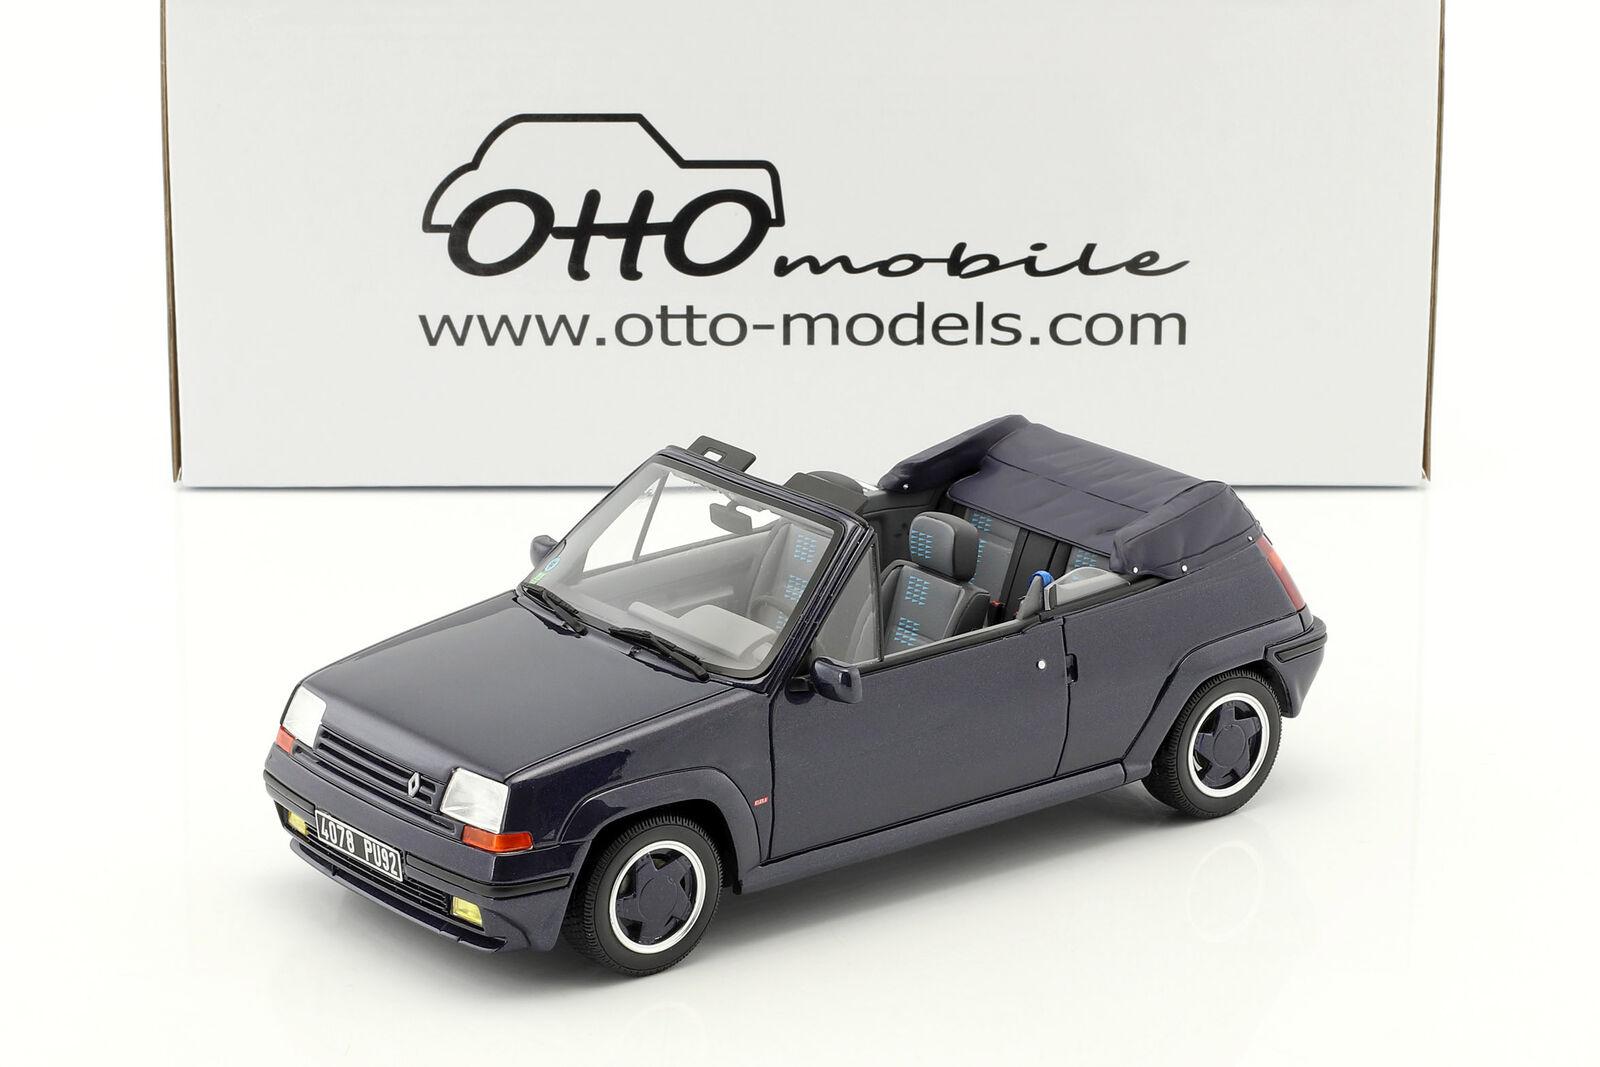 Renault 5 GT Turbo Cabriolet by EBS Baujahr 1990 bleu 1 18 OttOmobile